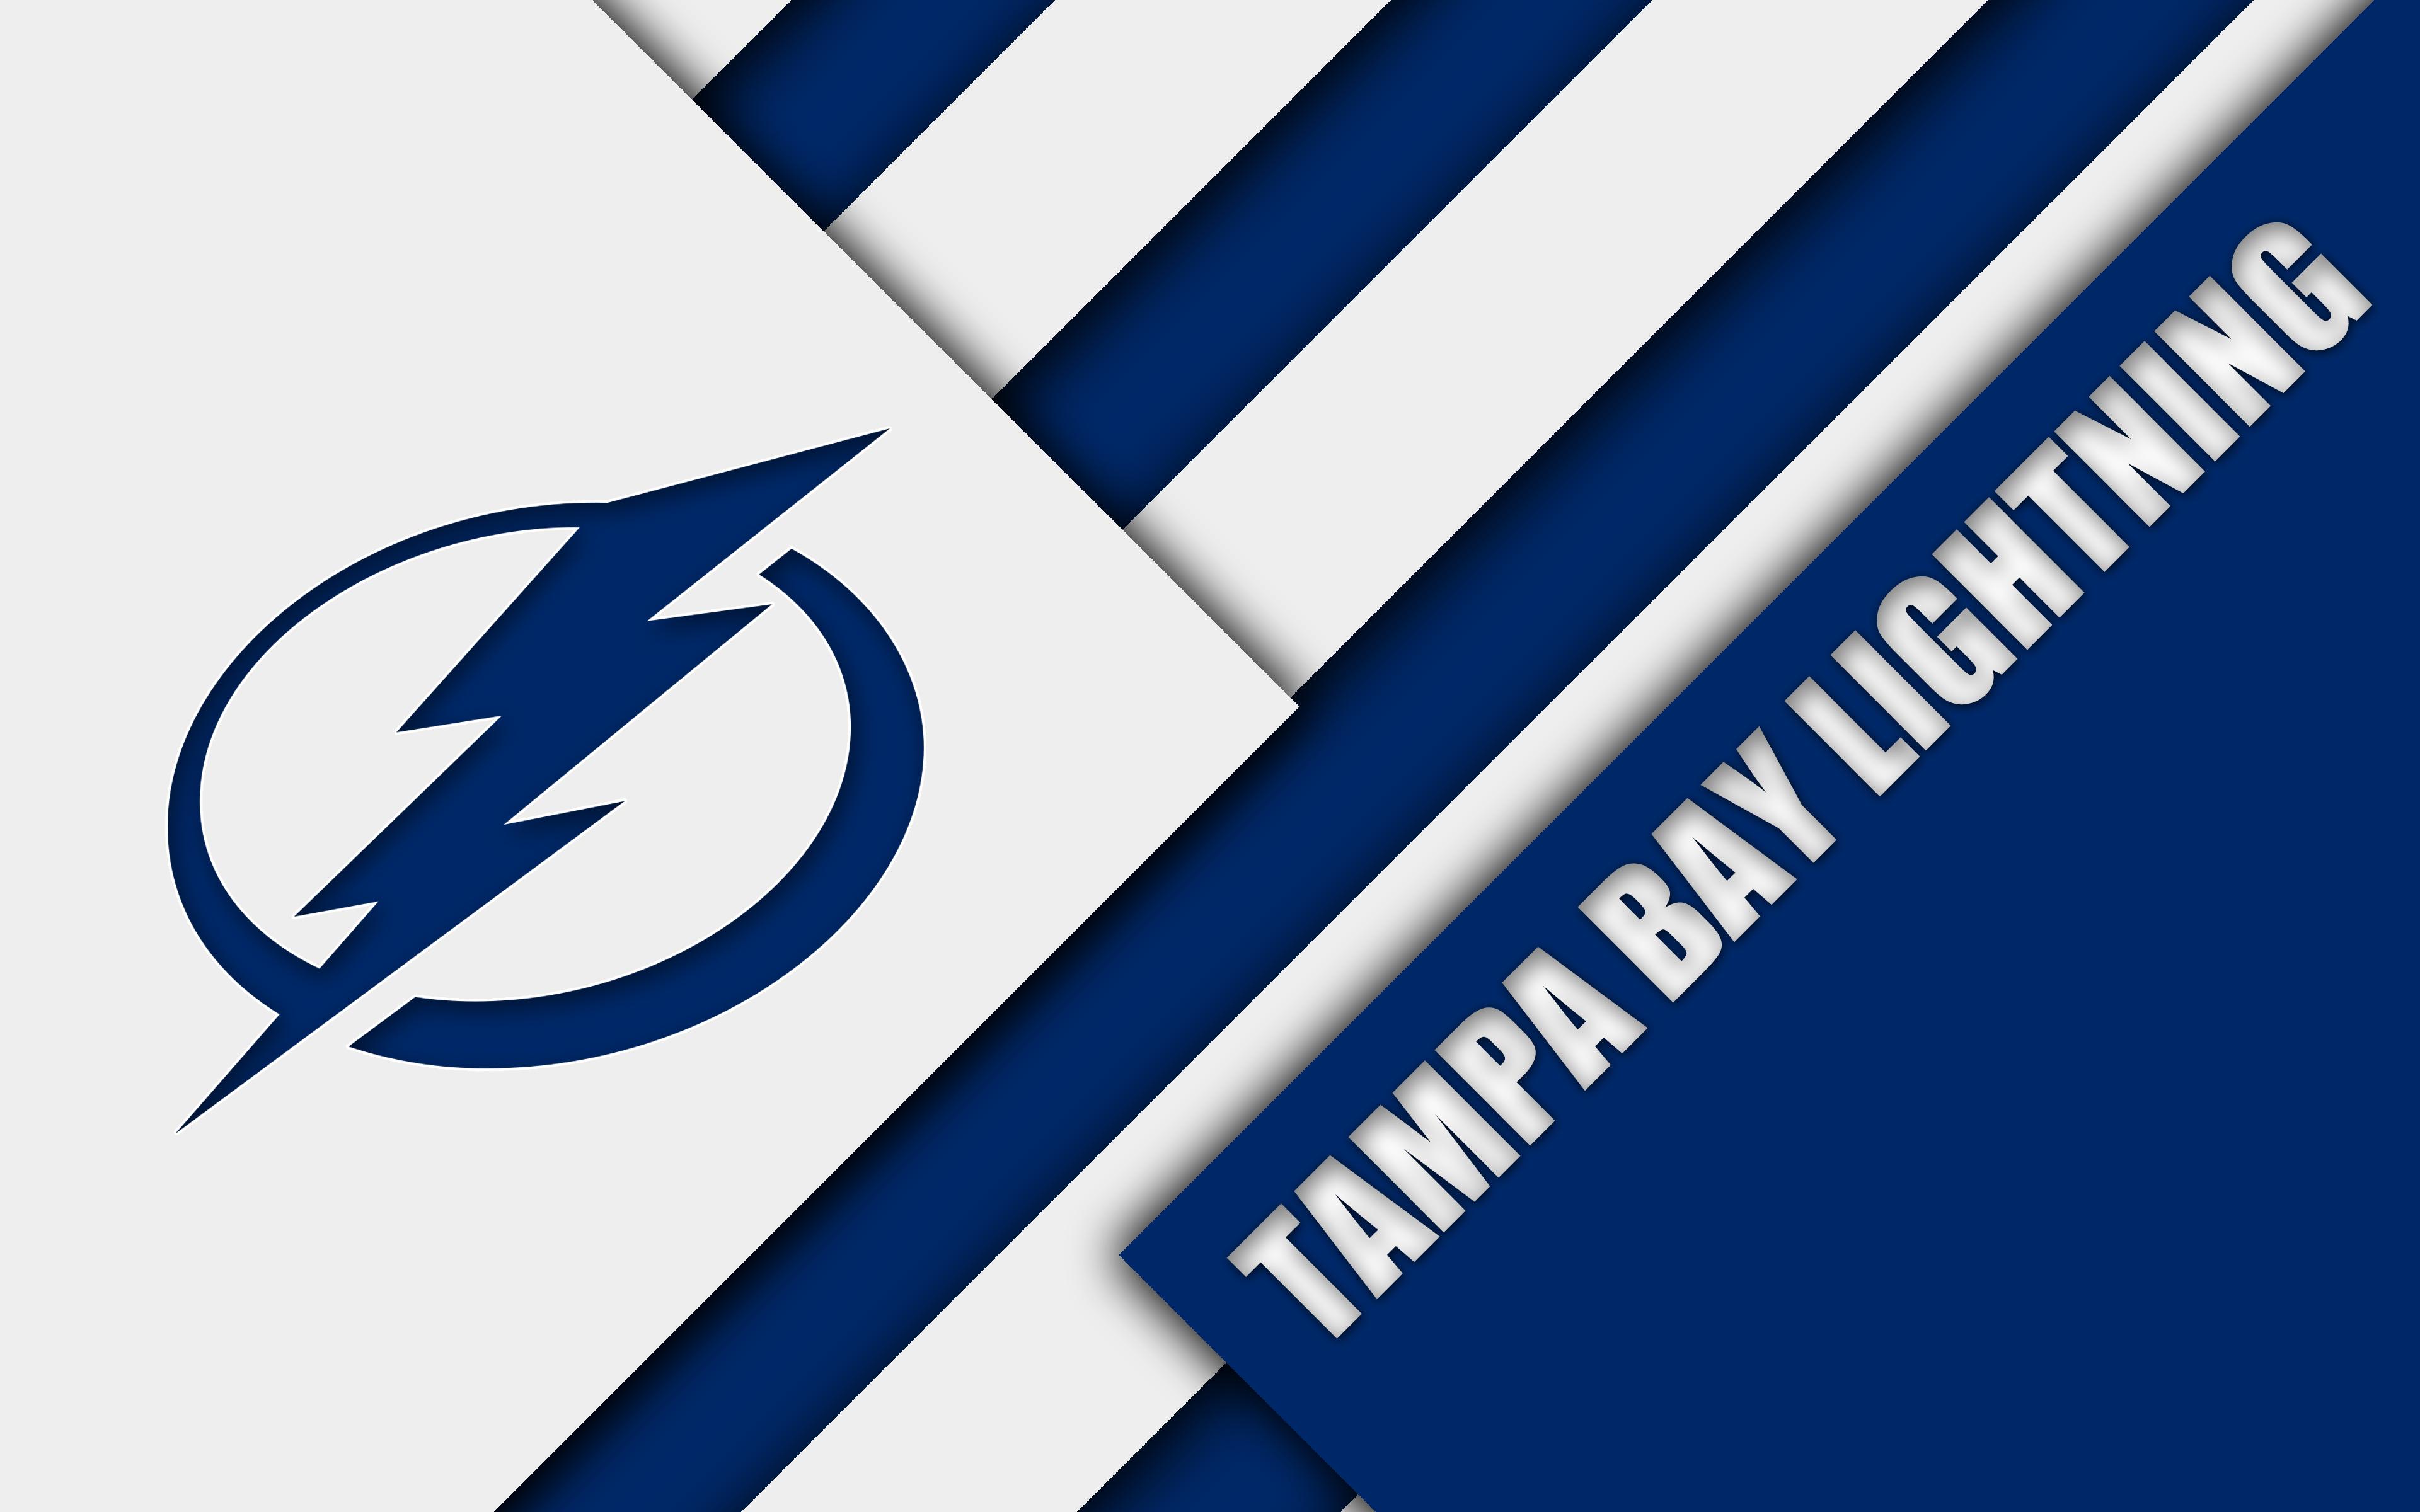 Tampa Bay Lightning 4k Ultra Hd Wallpaper Background Image